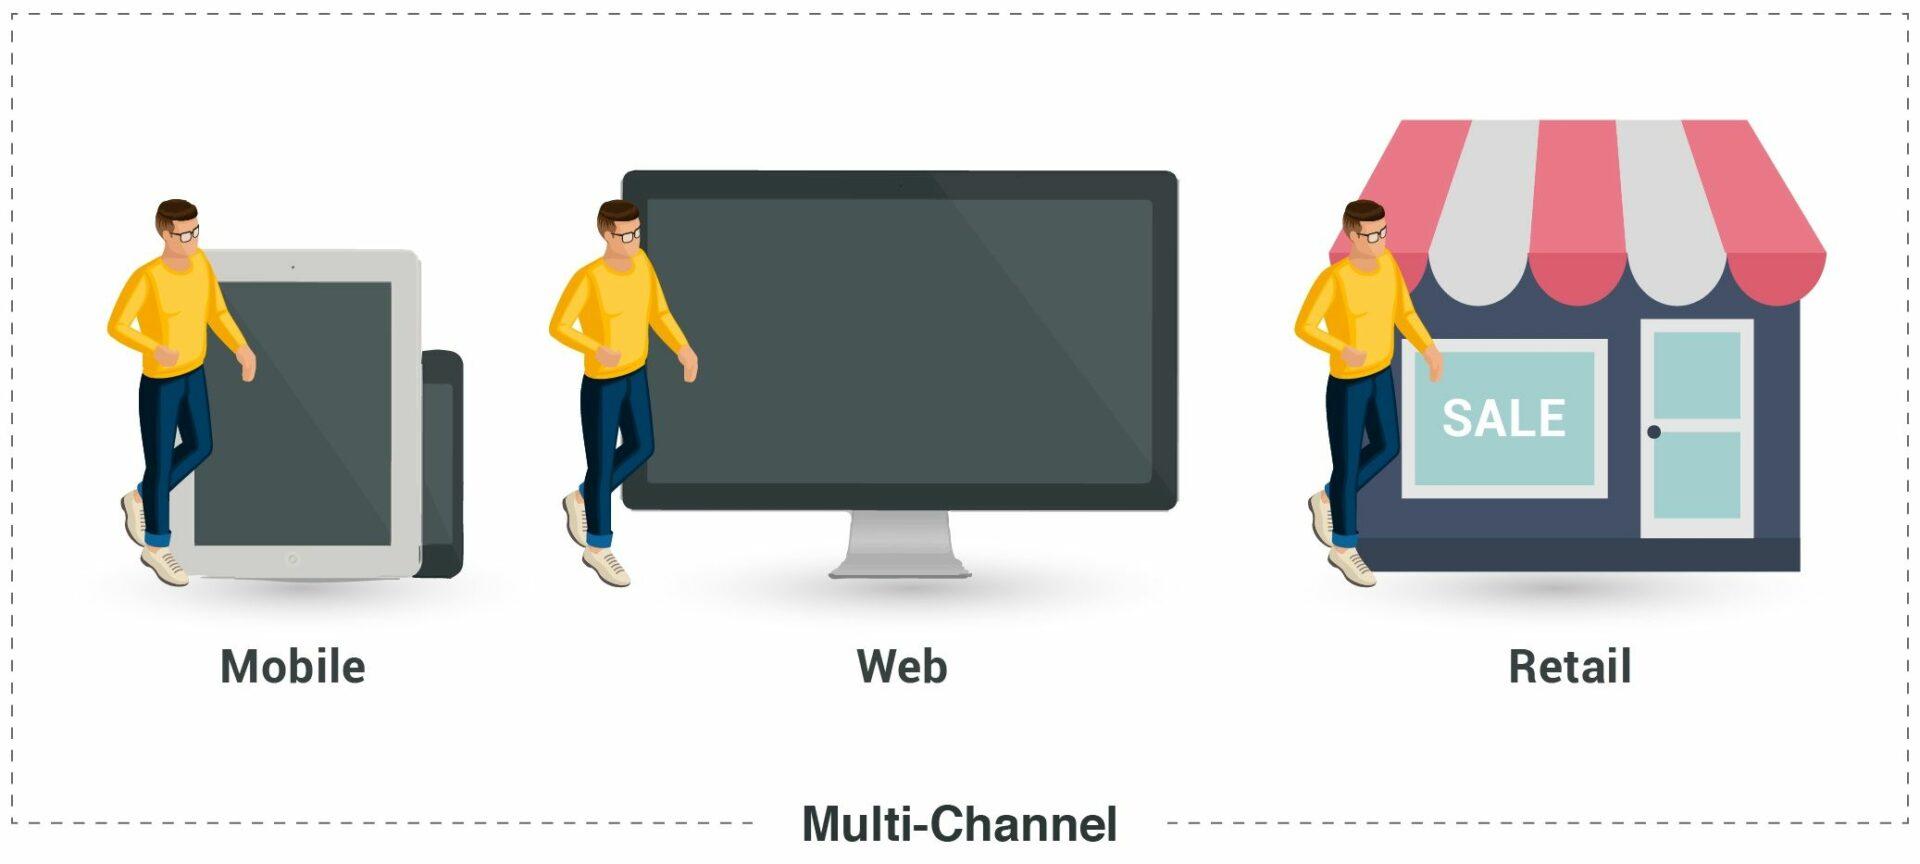 multichannel buyer journey: mobile, web, retail